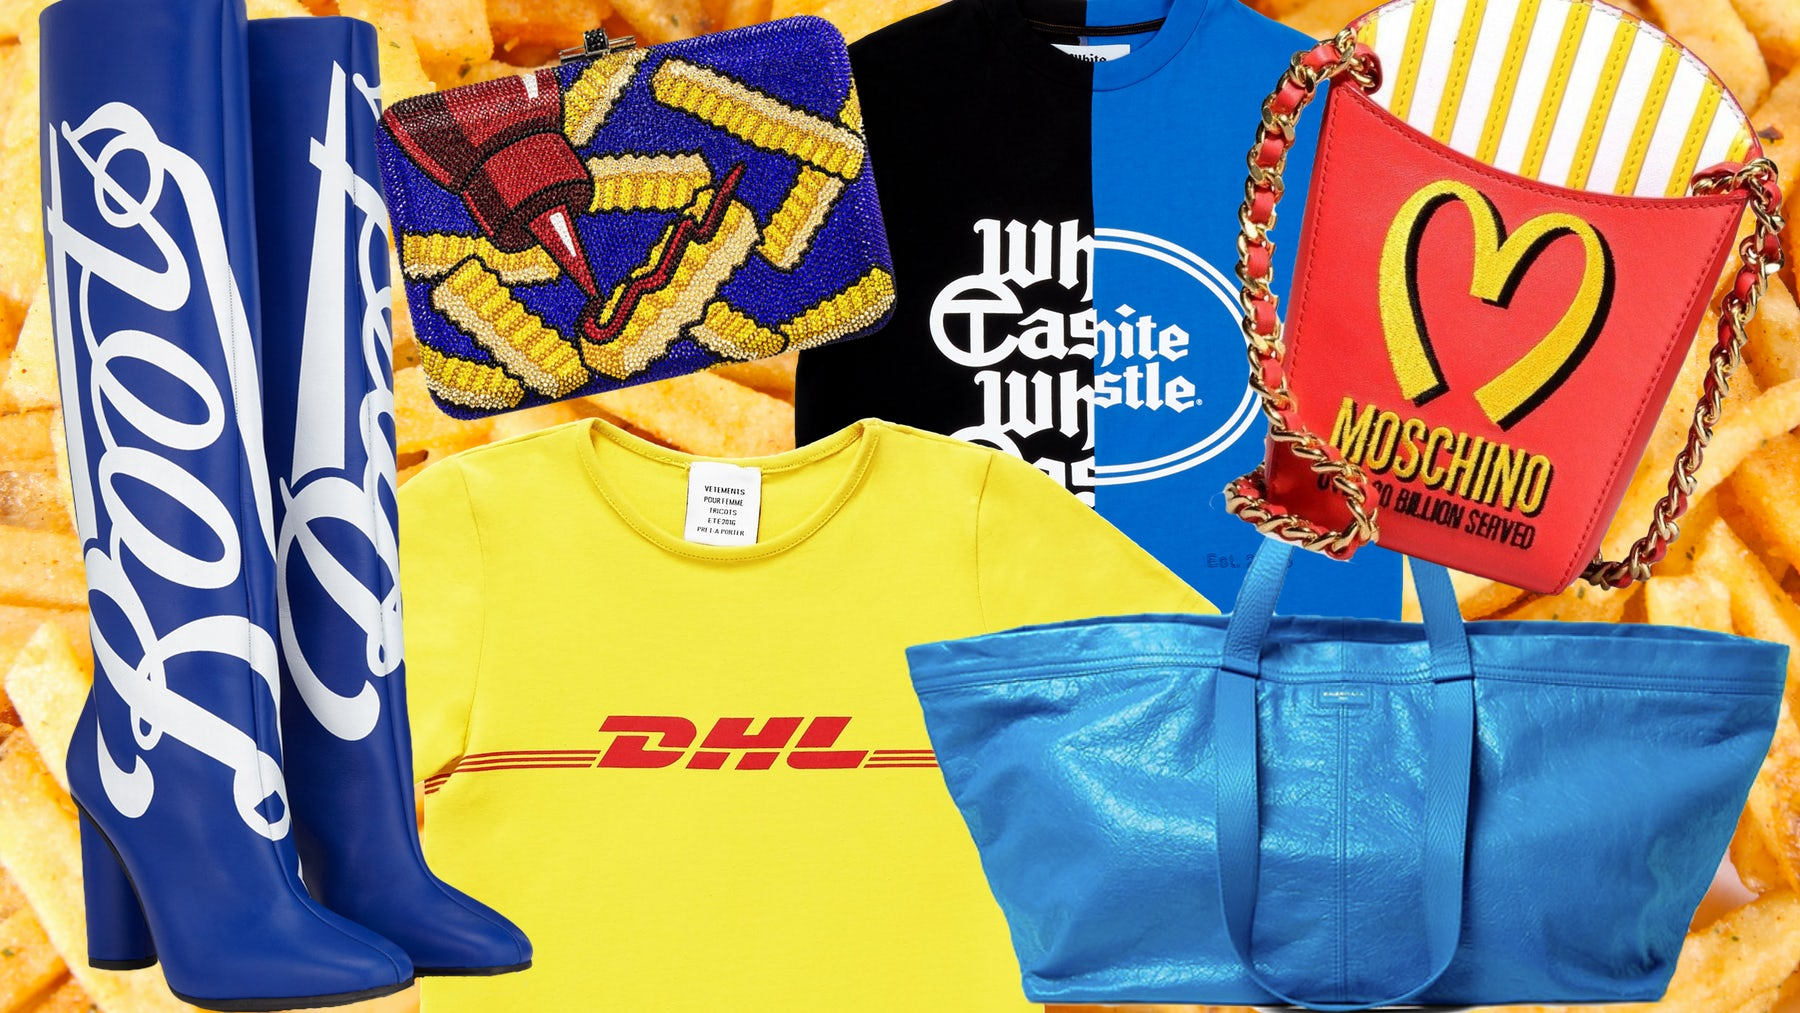 Left to right: Anya Hindmarch 'Boots' boots, Judith Leiber clutch, Vetements 'DHL' t-shirt, Telfar 'White Castle' t-shirt, Moschino purse, Balenciaga tote | Collage: Victoria Berezhna